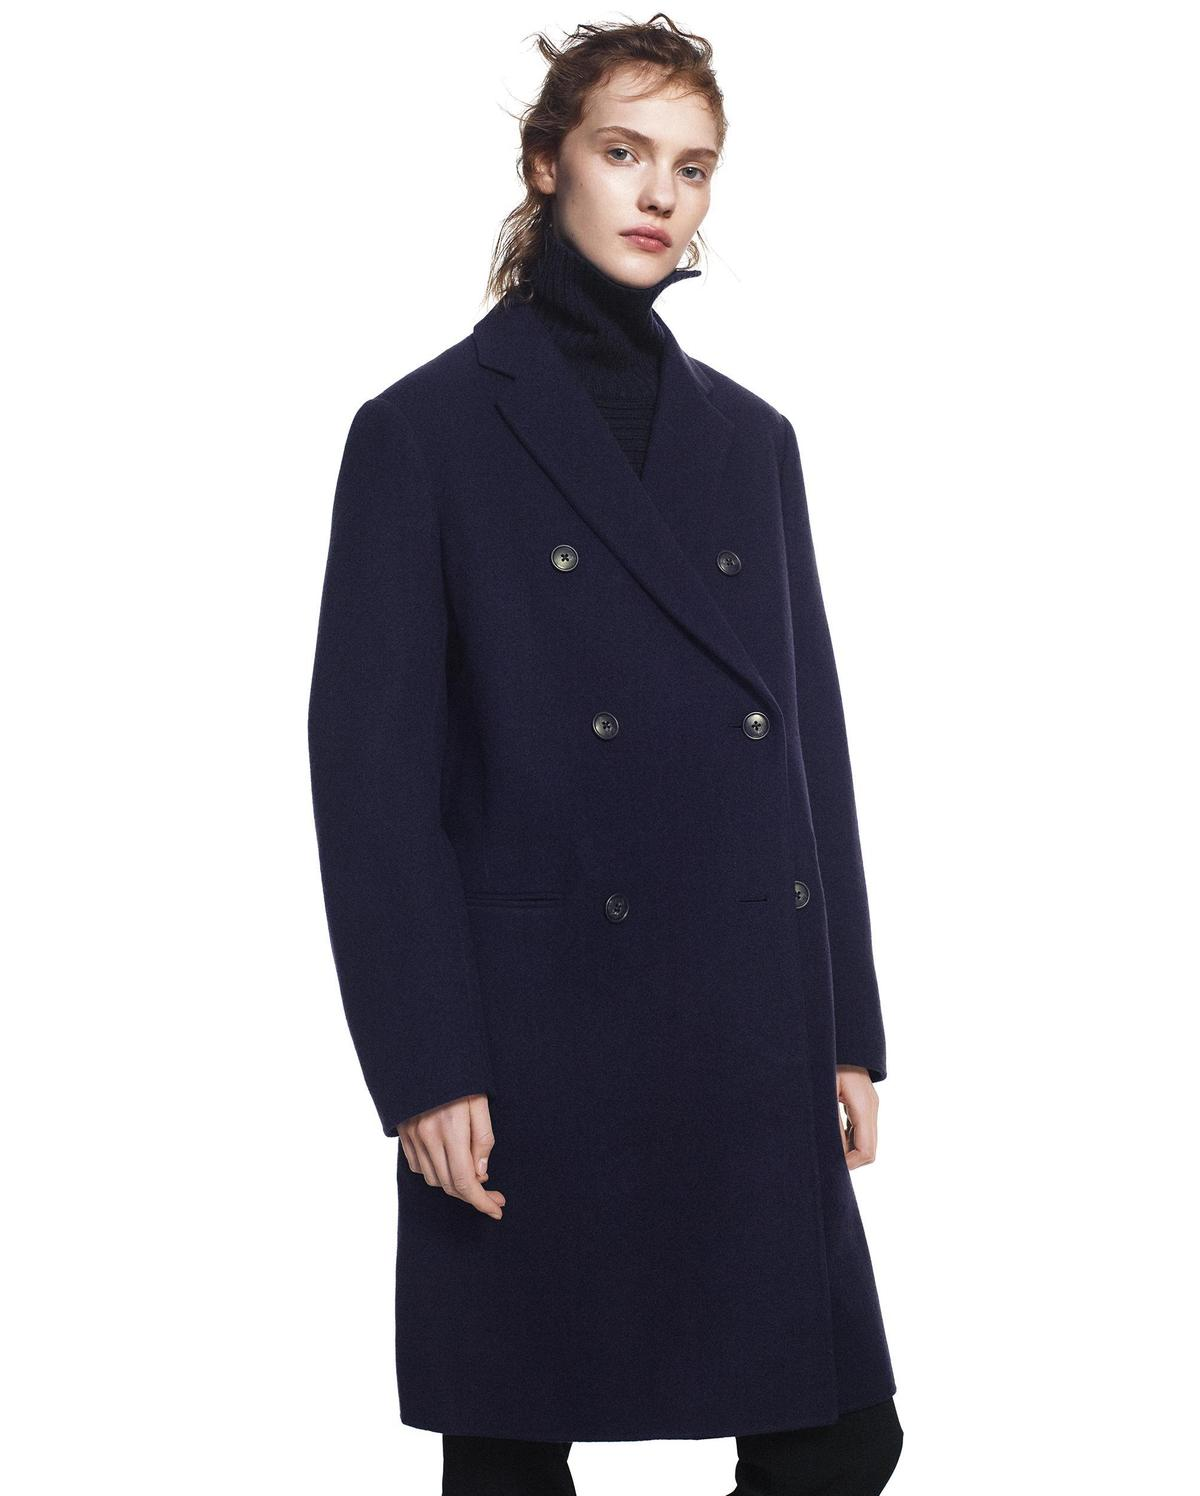 +J雙面織紋雙排扣大衣。NT$7,990。(台灣優衣庫提供)